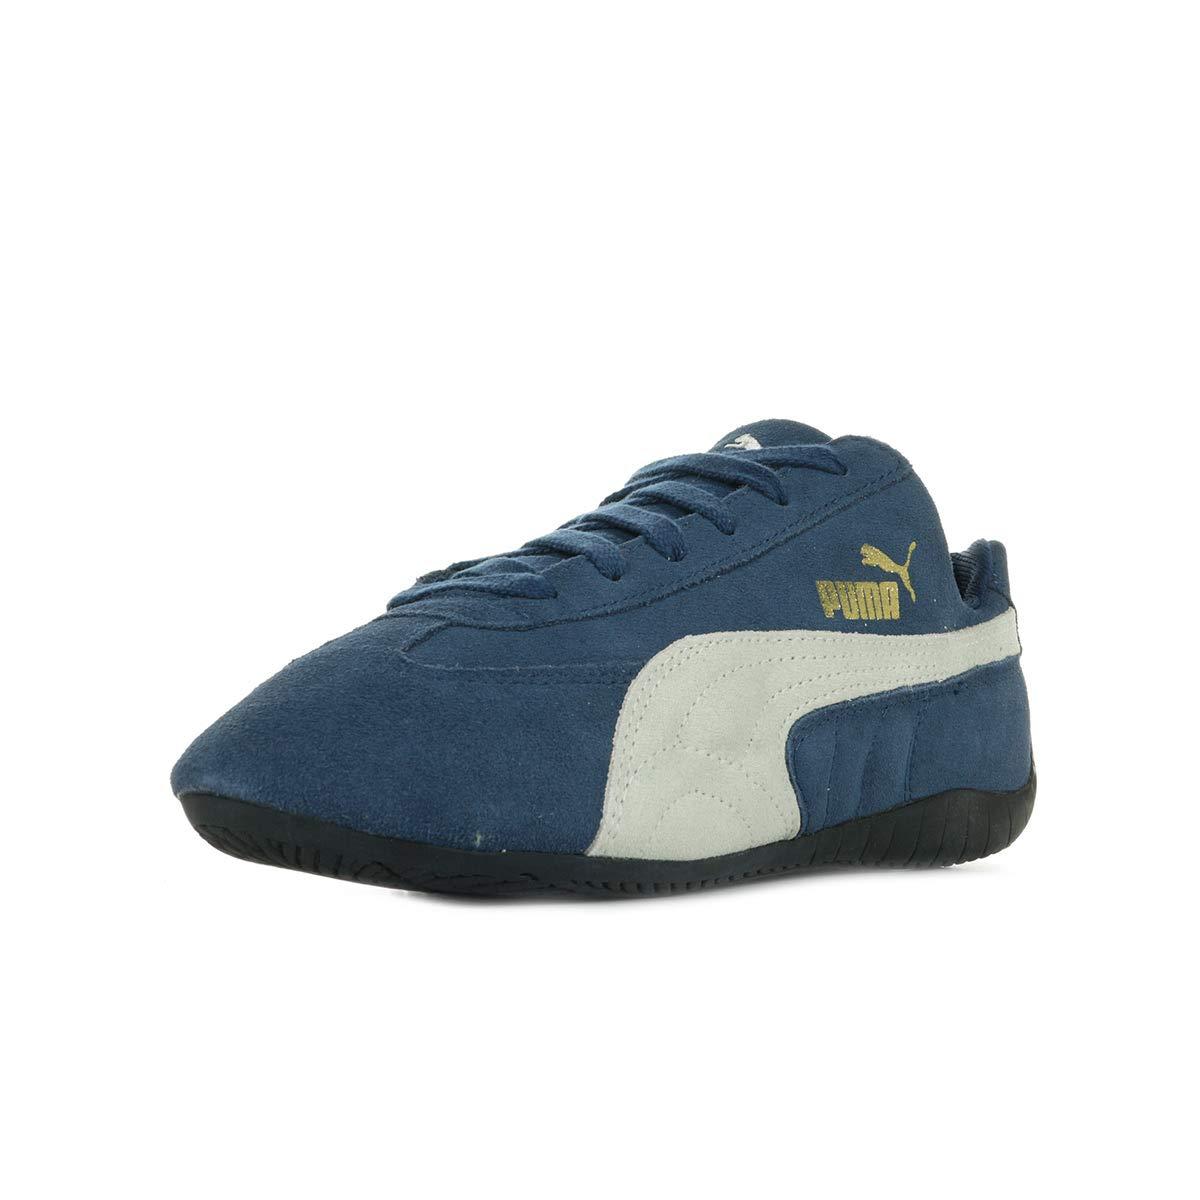 Puma Speed Cat Unisex Adult Low Top Sneakers, insignia blue-natural, 36 EU